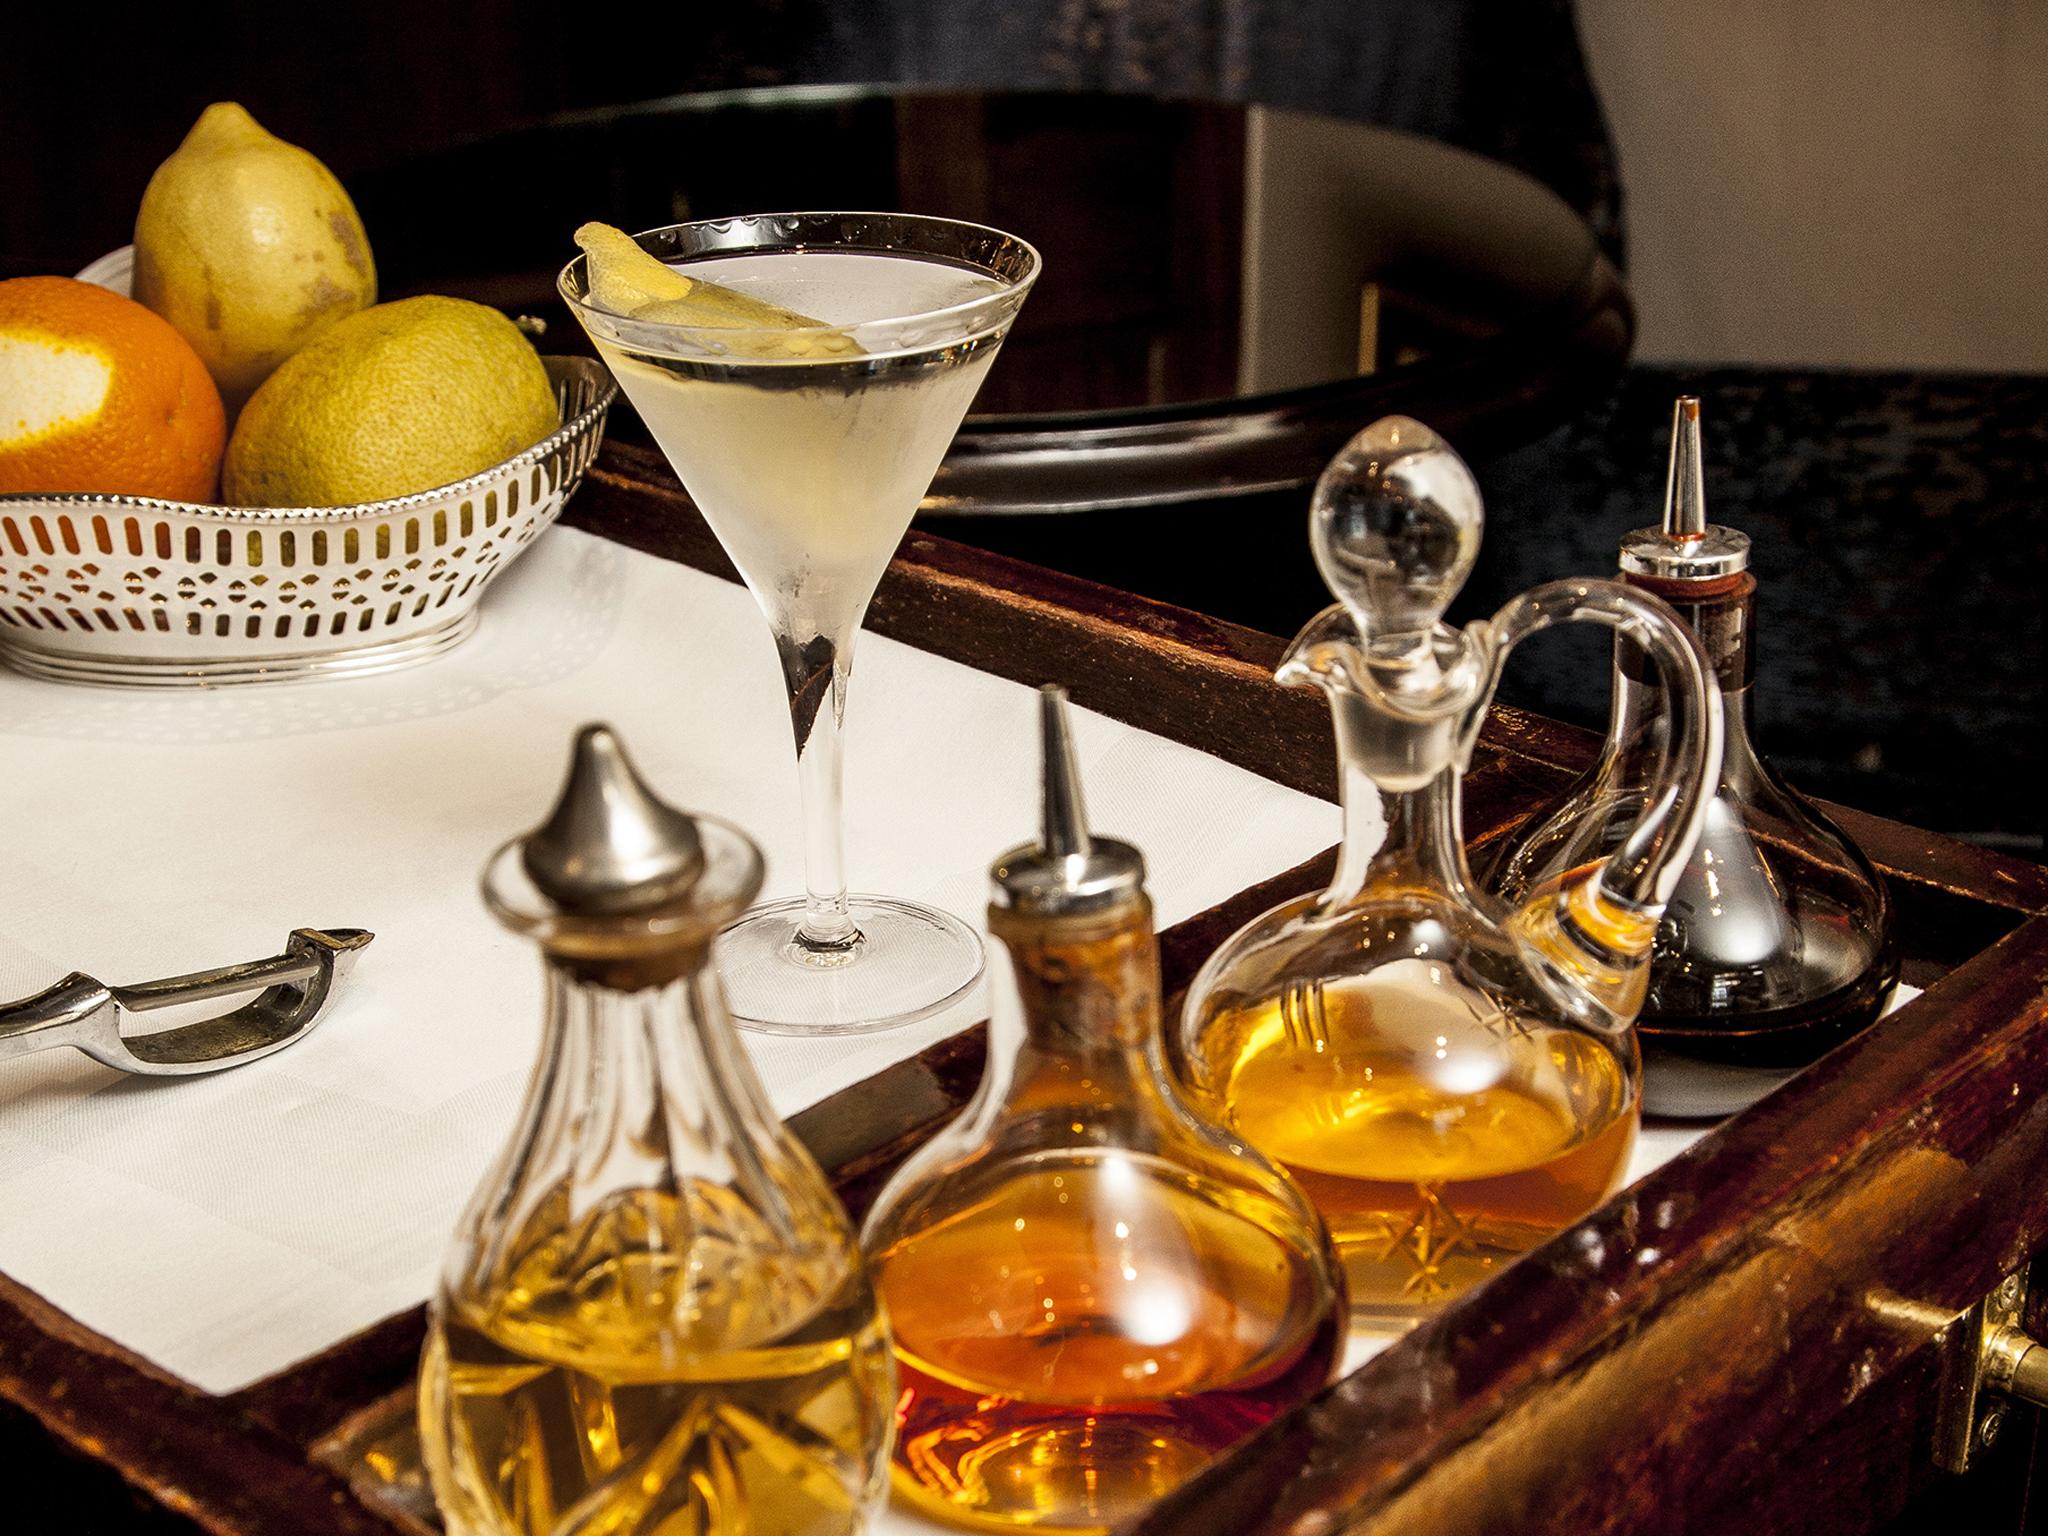 London Signature cocktails, duke's, gin martini